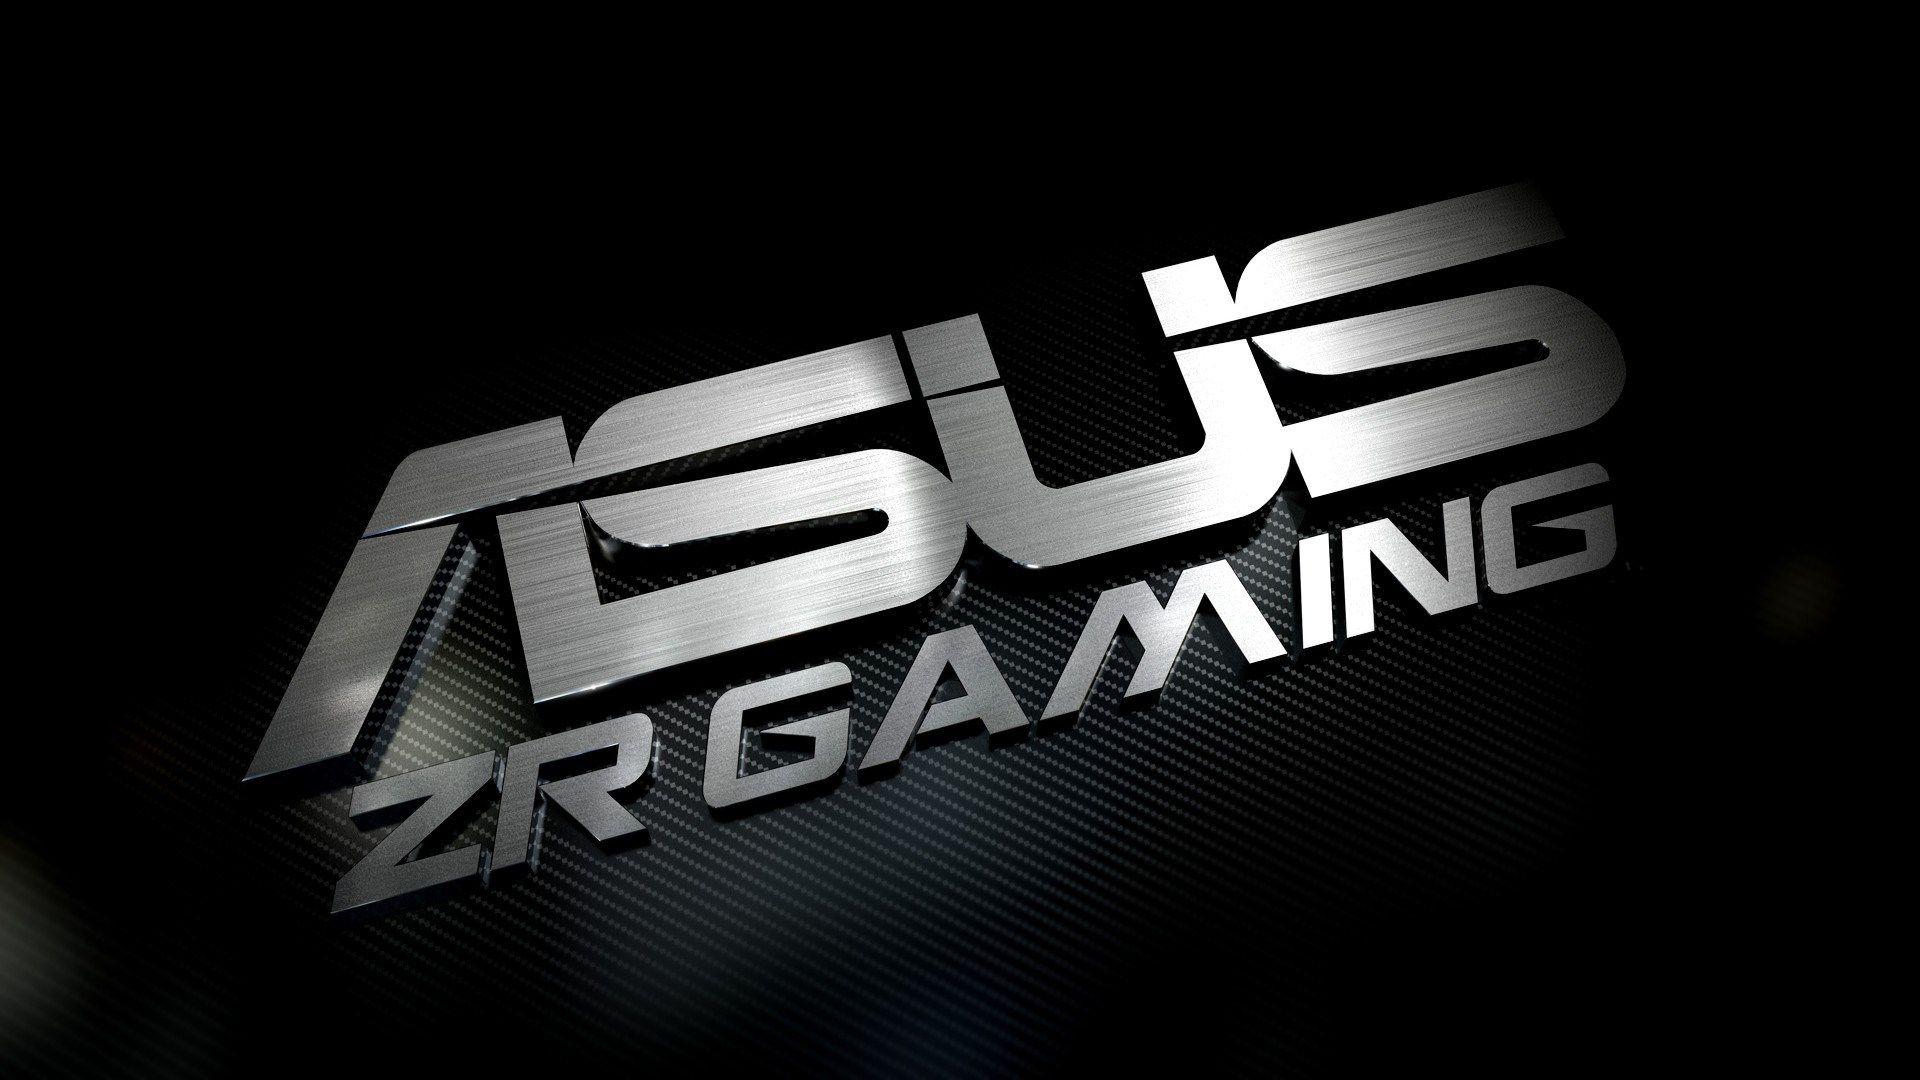 Asus Gaming Wallpapers Hd Logo